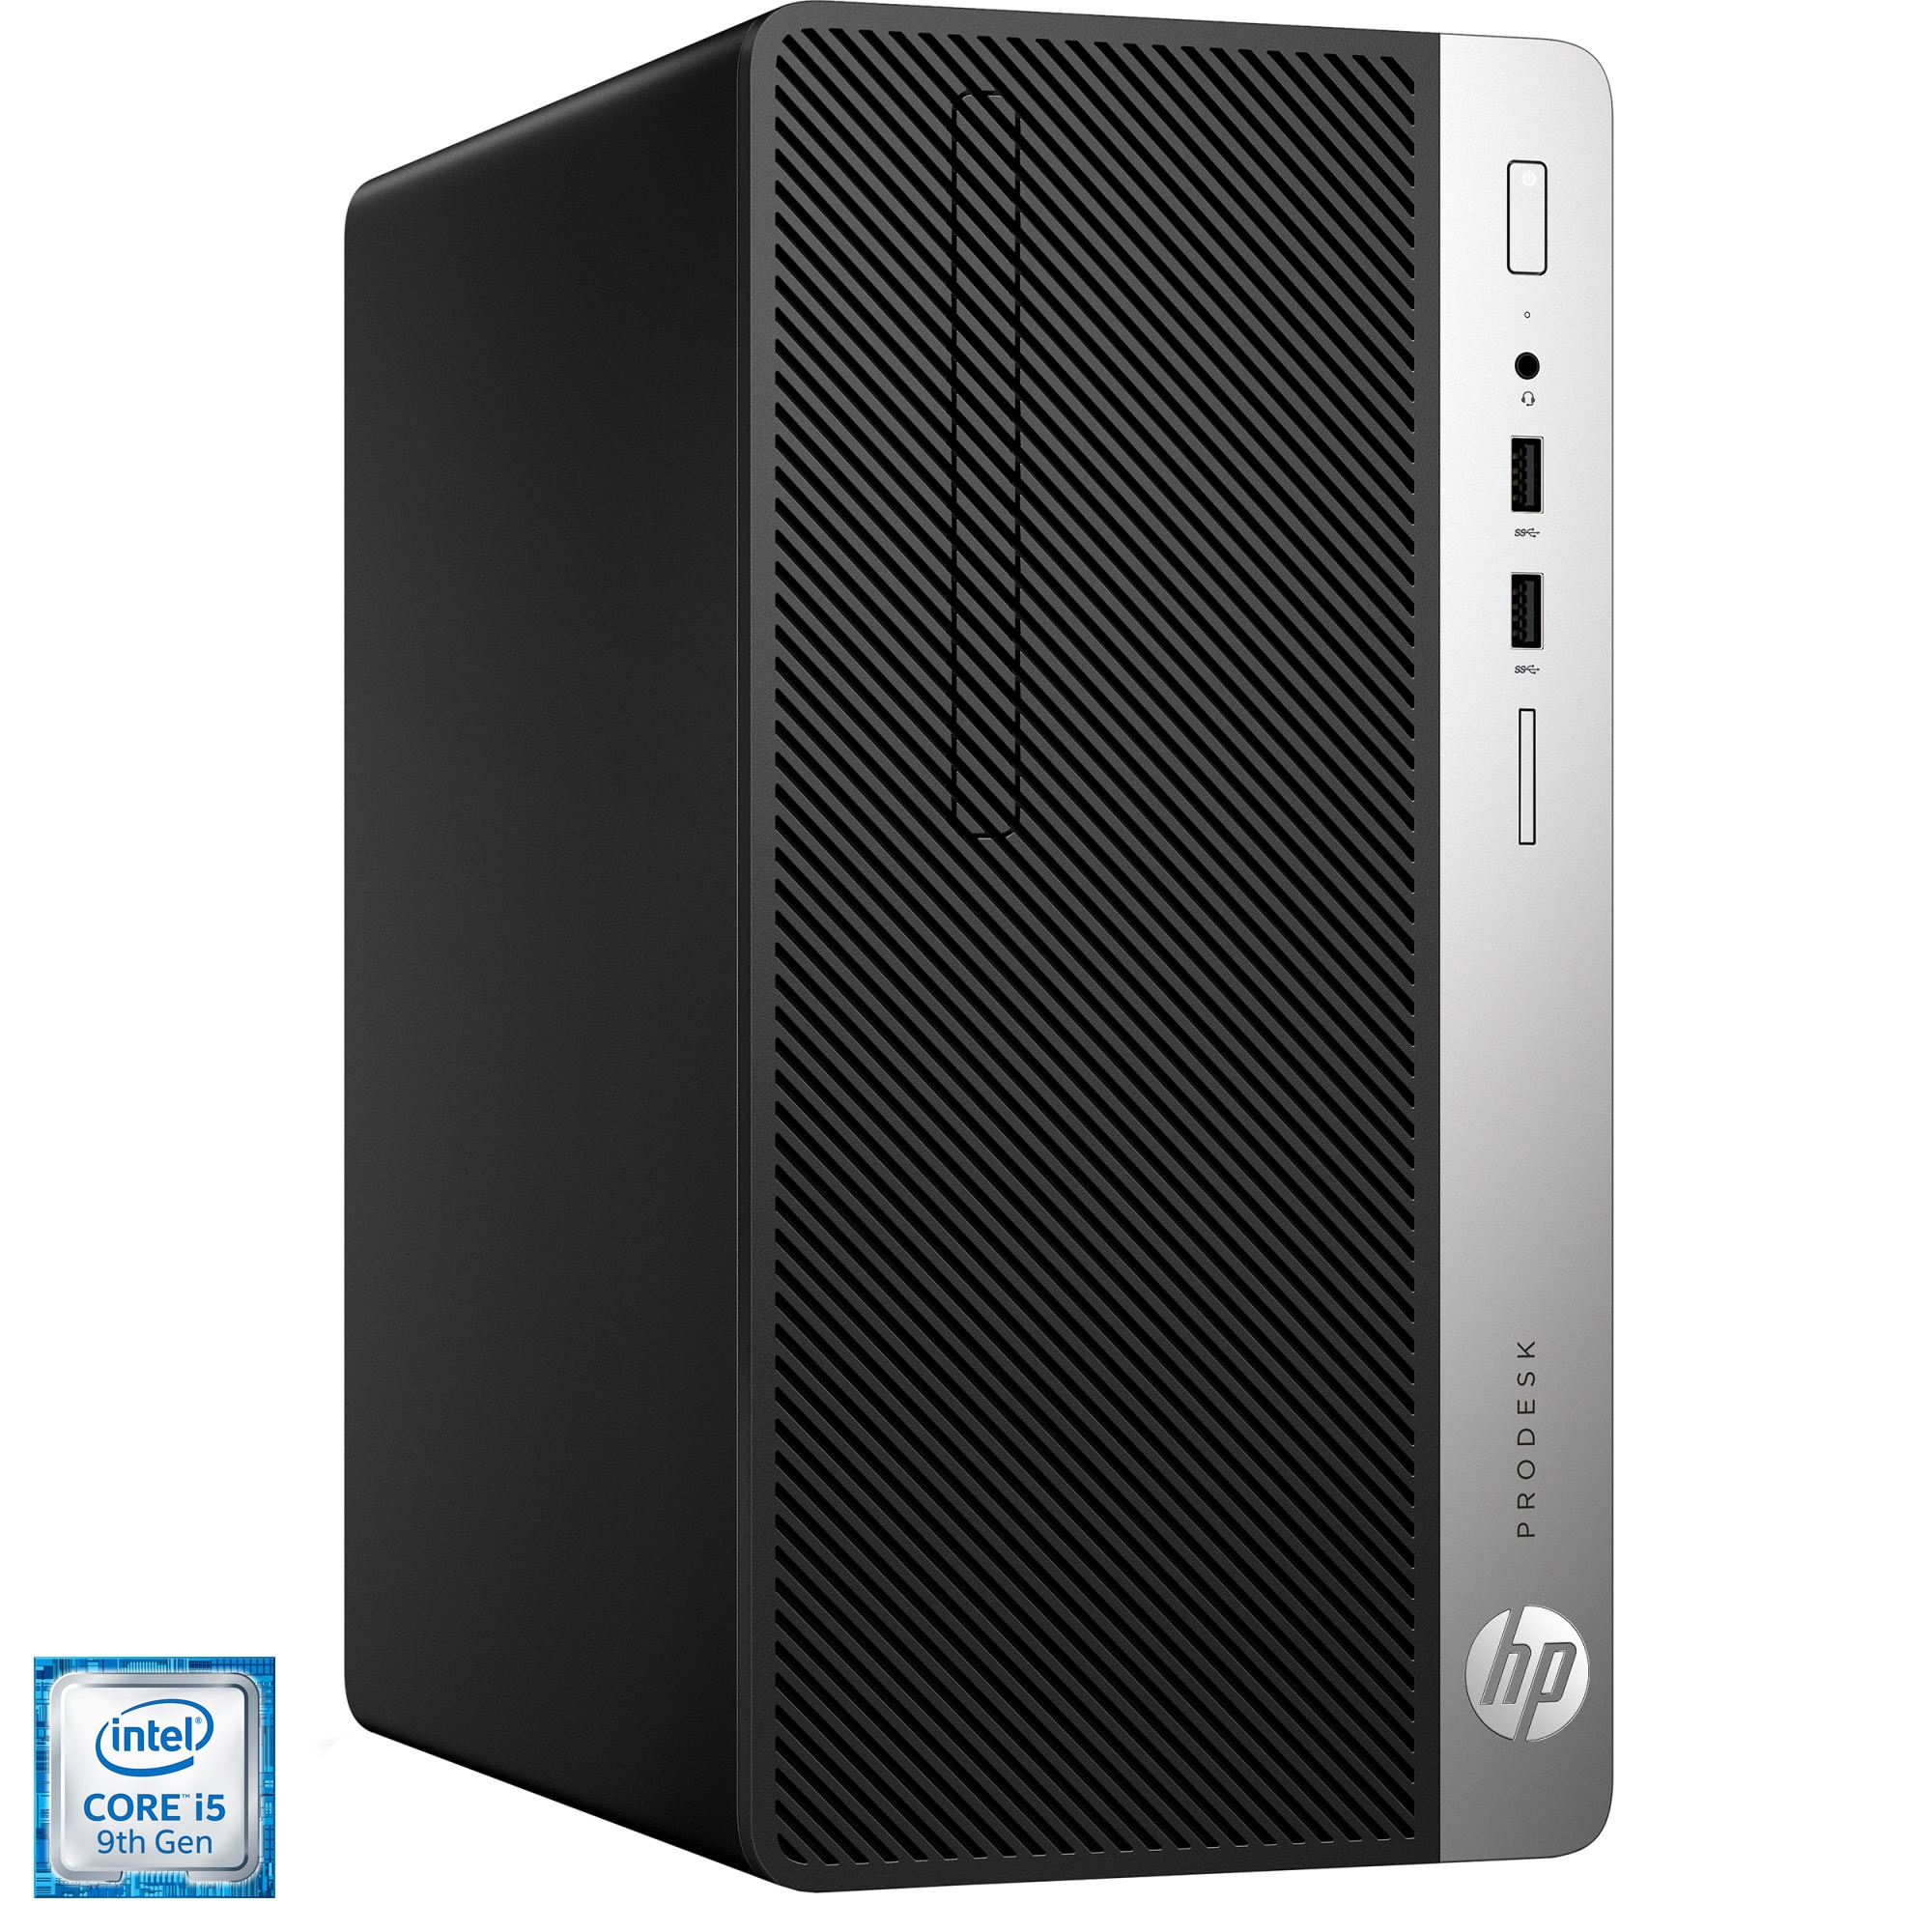 Fotografie Sistem Desktop PC HP ProDesk 400 G6 cu procesor Intel® Core™ i5-9400F pana la 4.10 GHz, Coffee Lake, 16GB DDR4, SSD 512GB NVMe, DVD-RW, AMD Radeon R7 430 2GB GDDR5, Windows 10 Pro